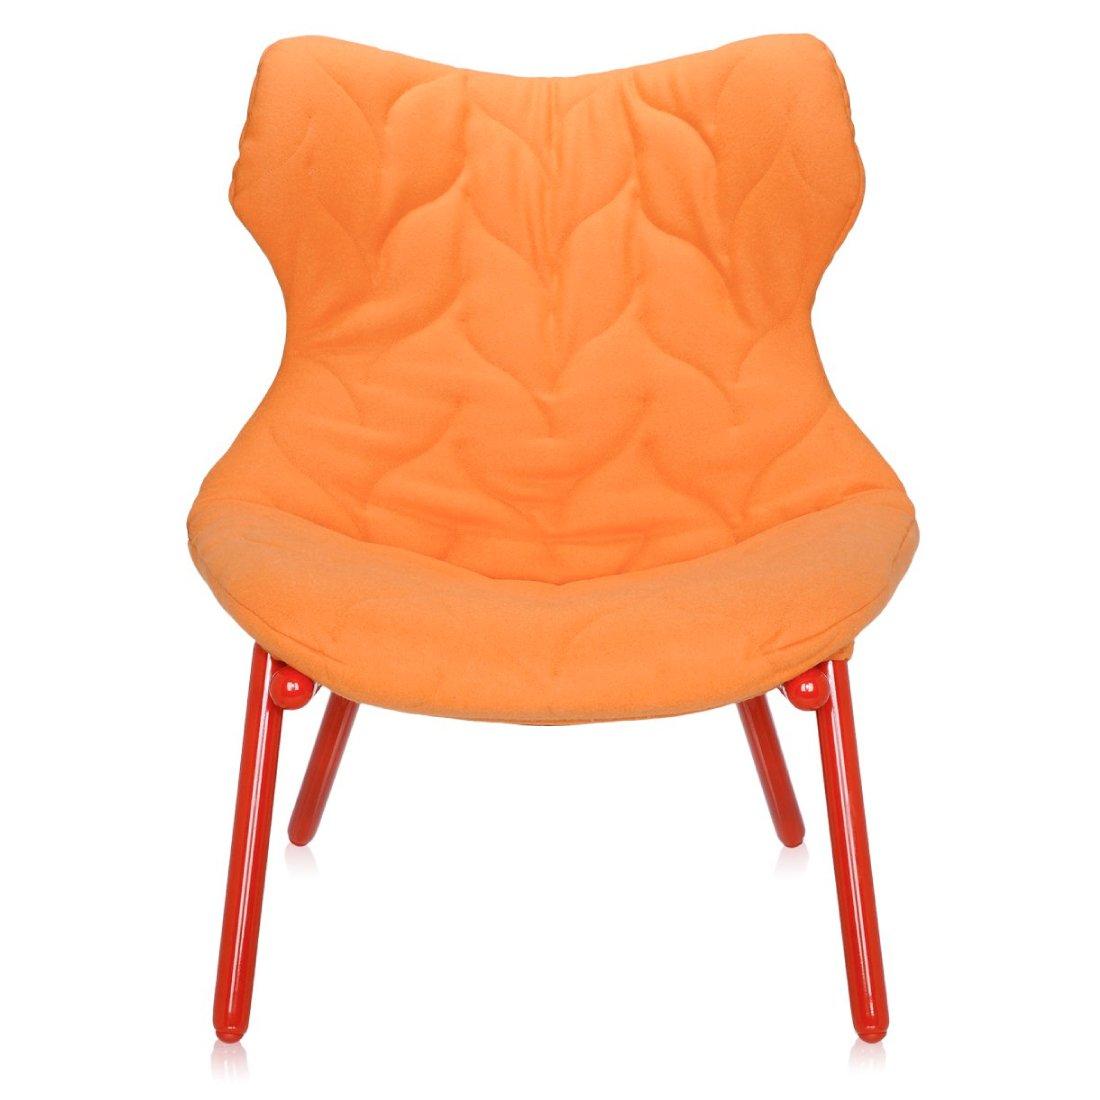 Kartell Foliage Fauteuil Cloth Oranje - Rood